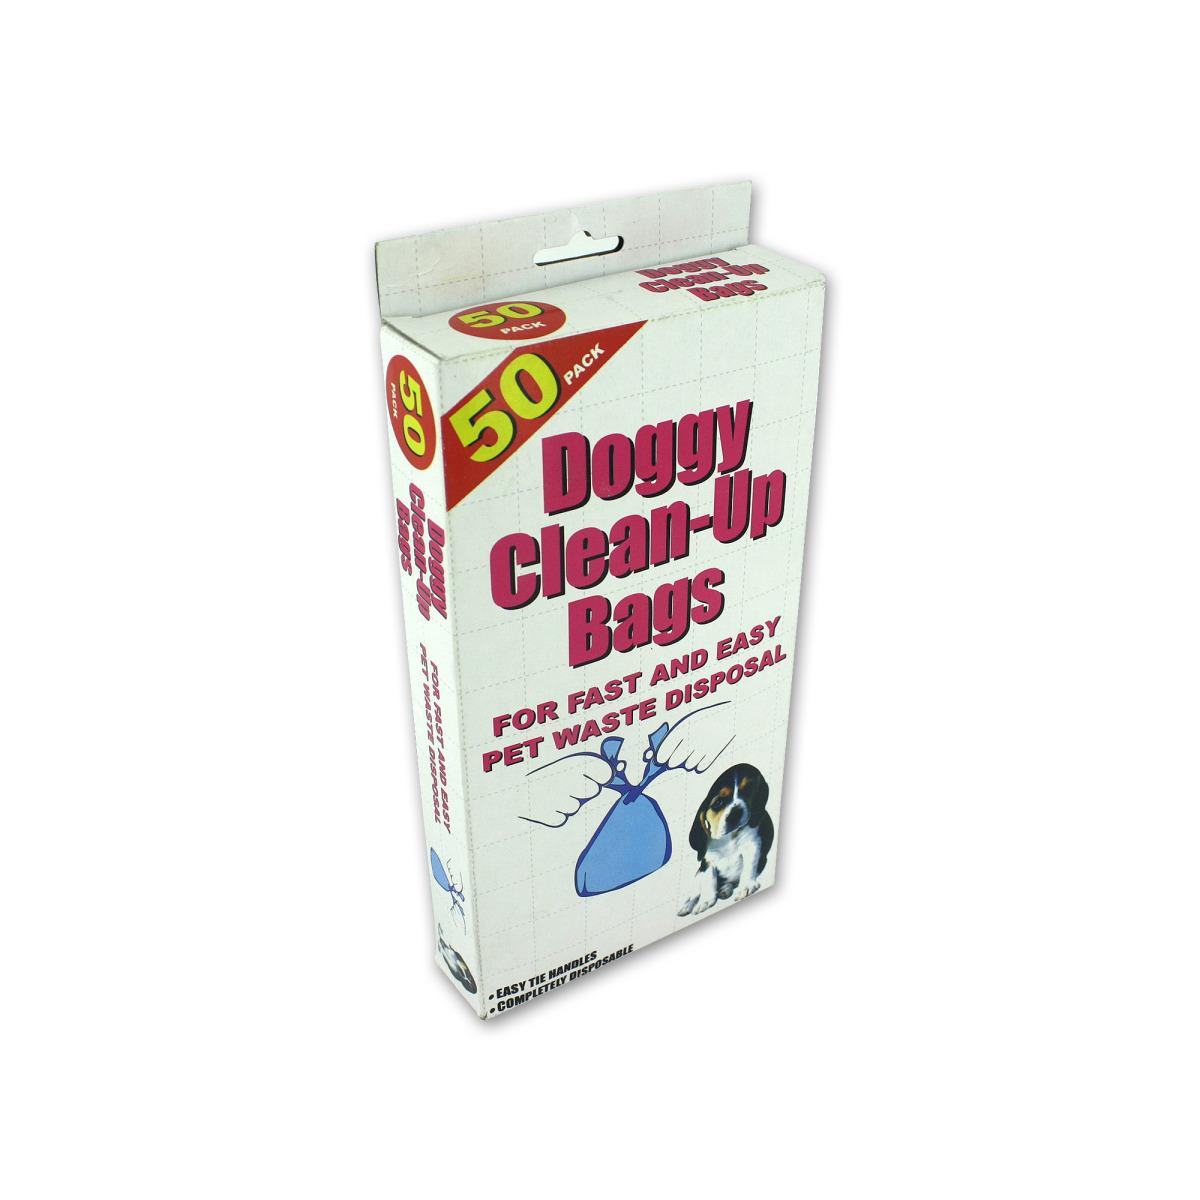 Waste management dumpster bag coupon / Mens wearhouse